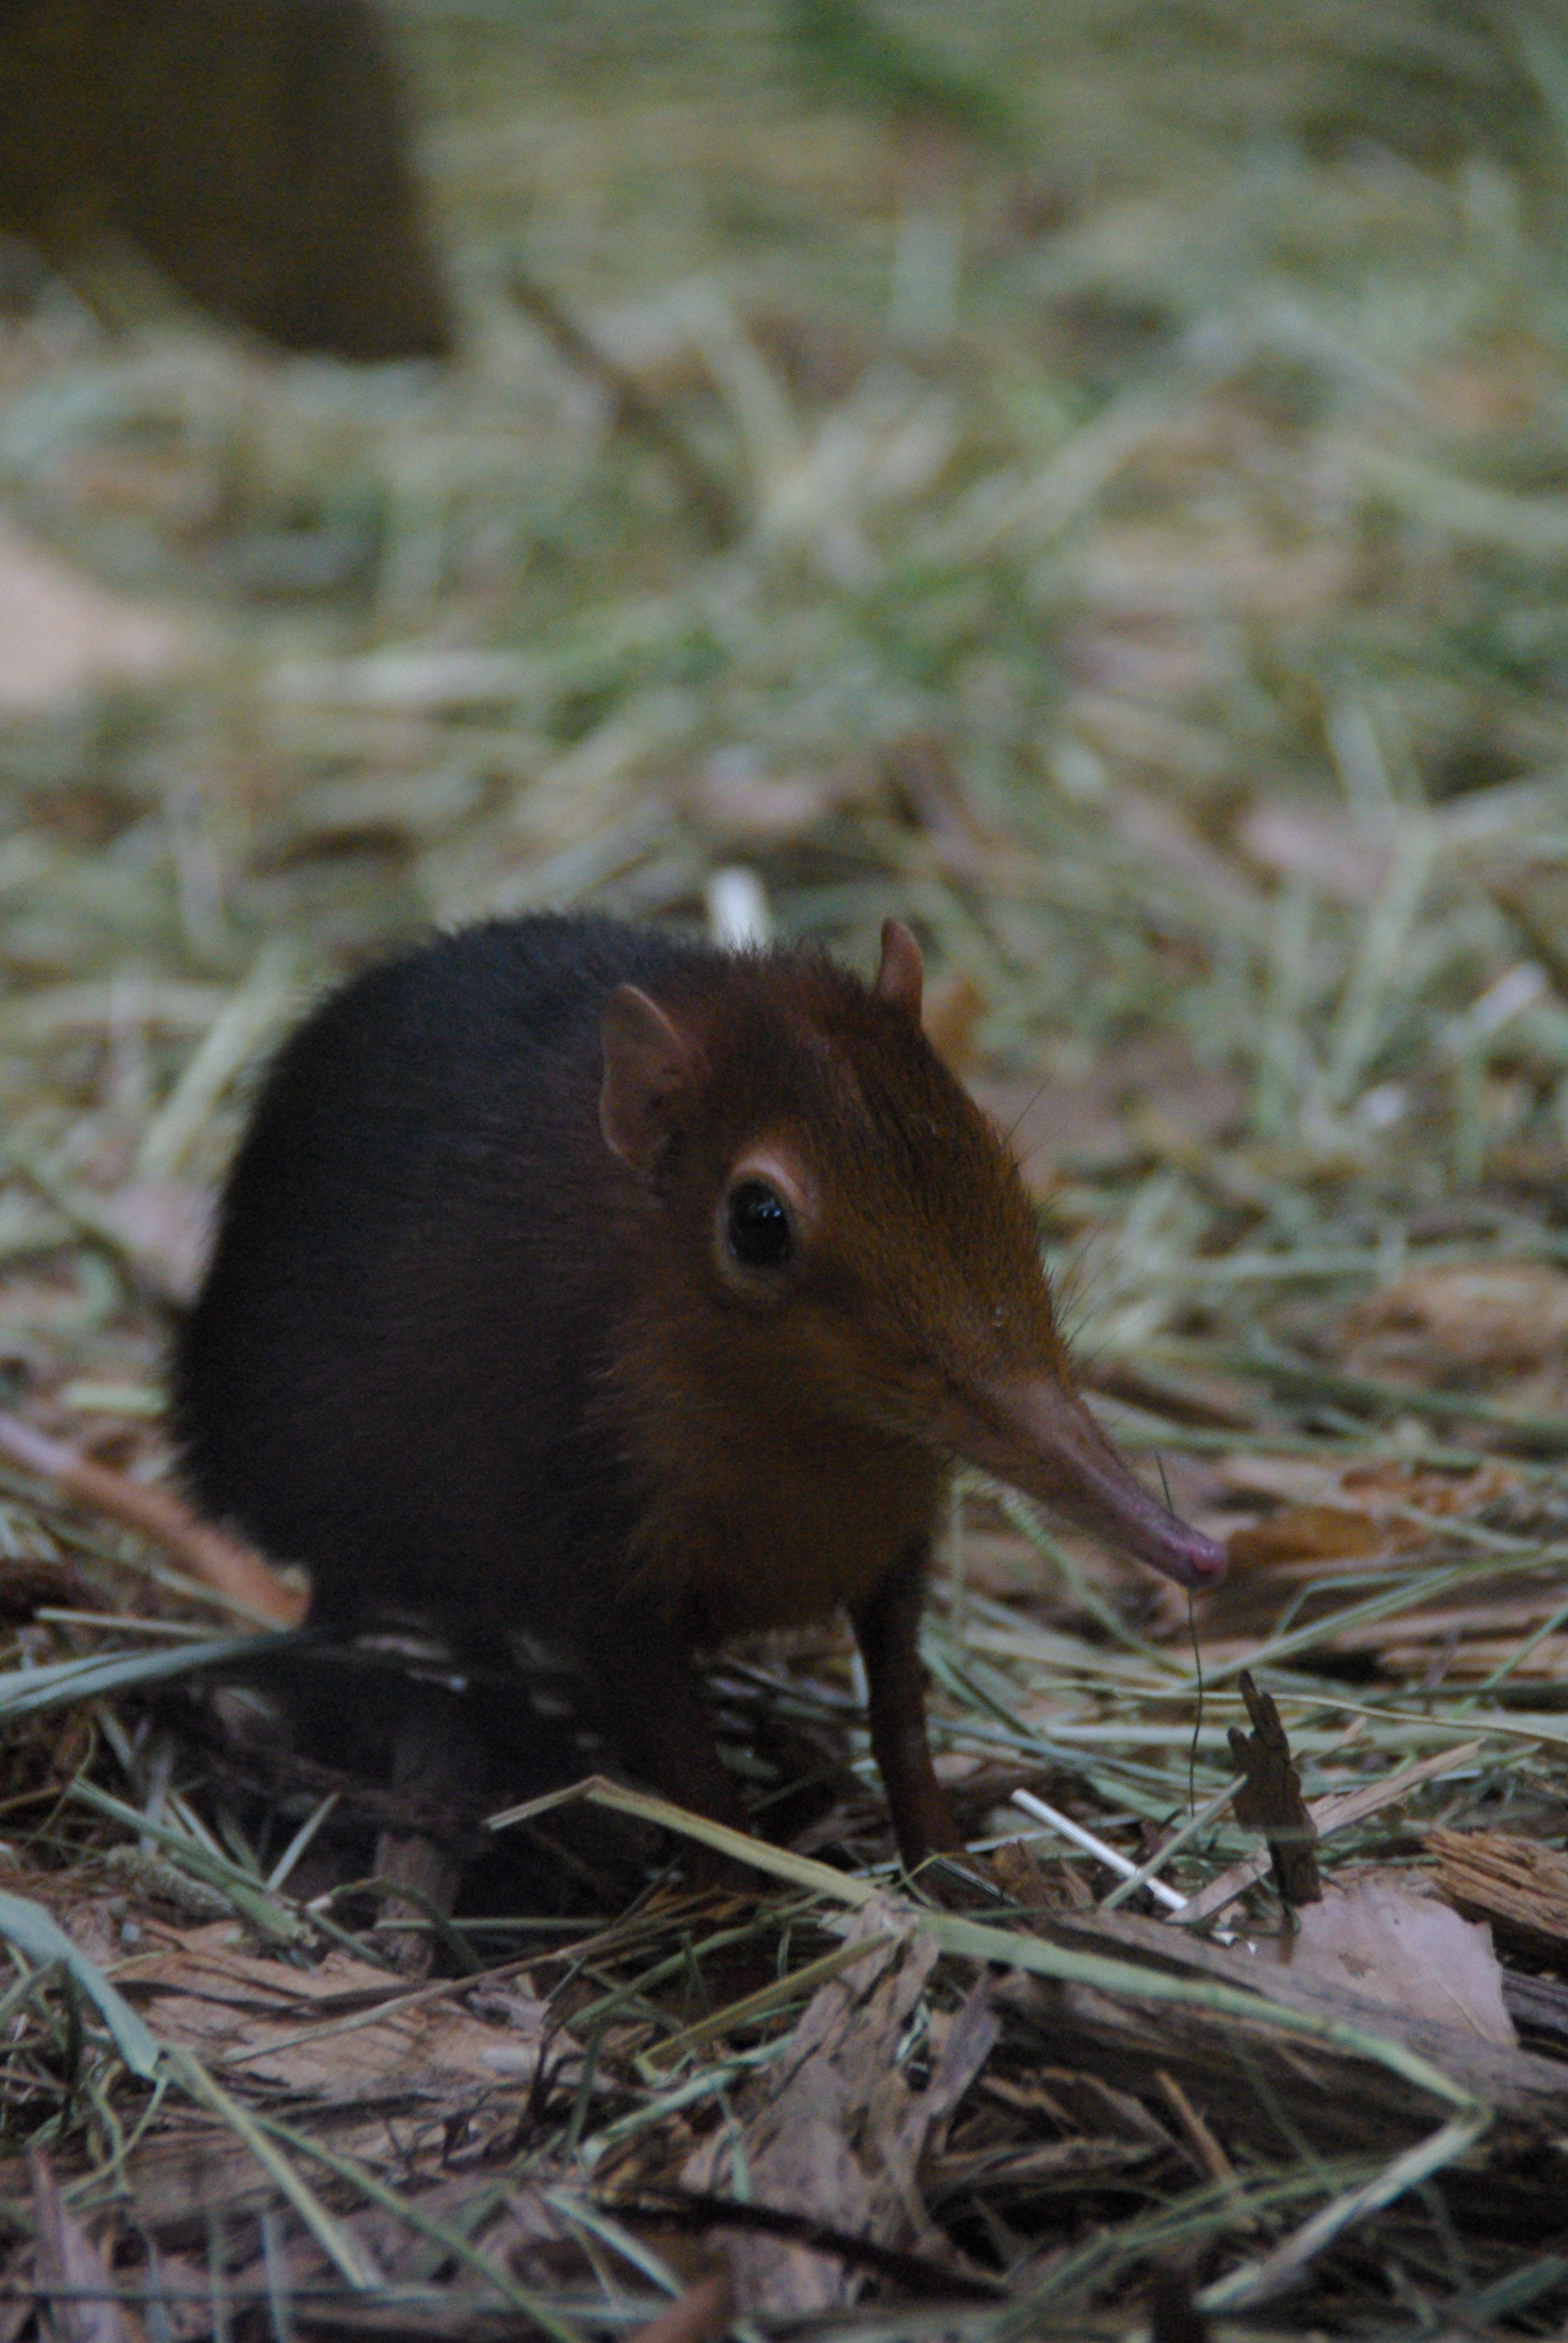 Small Animal Reptiles And Amphibian Habitats: Elephant Shrew BABYYYYYYY SHREWW